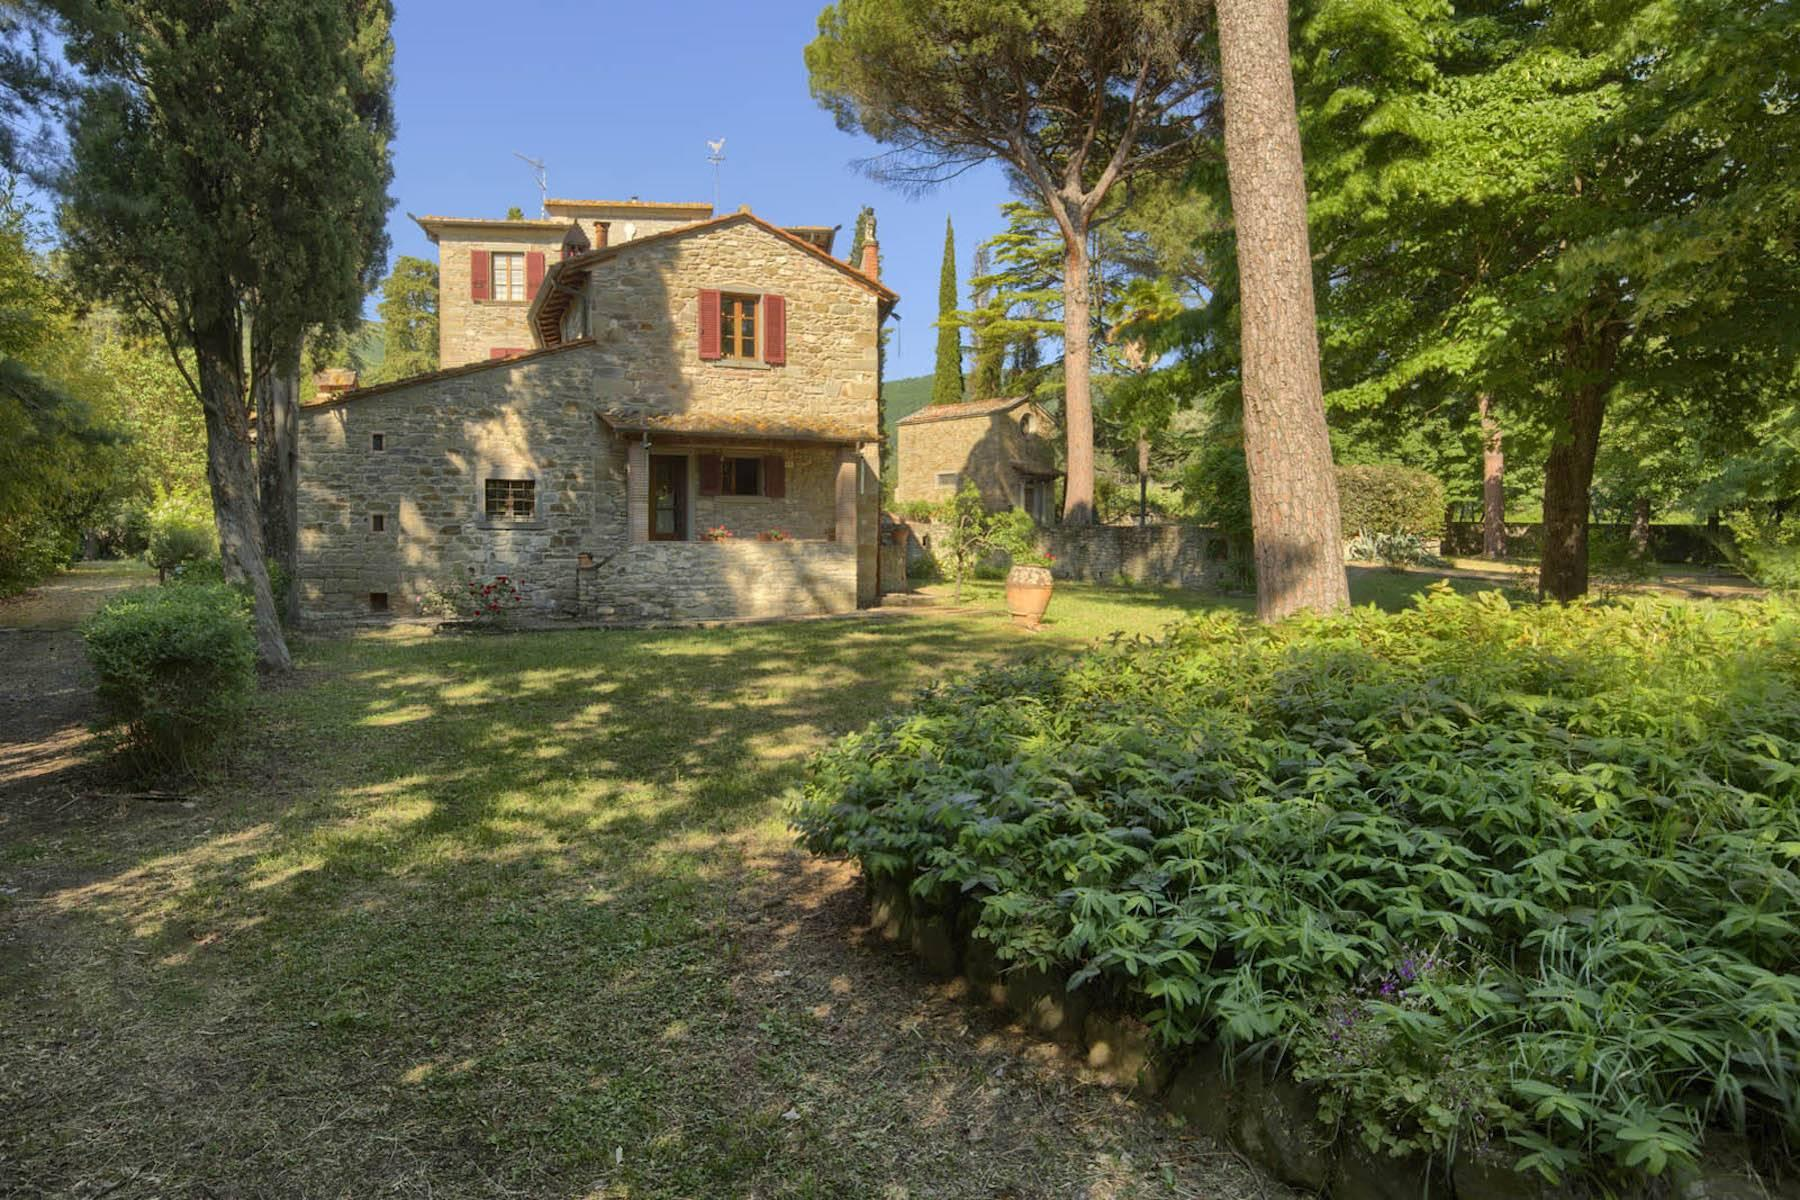 Historische Villa aus dem 1700 in Cortona - 6